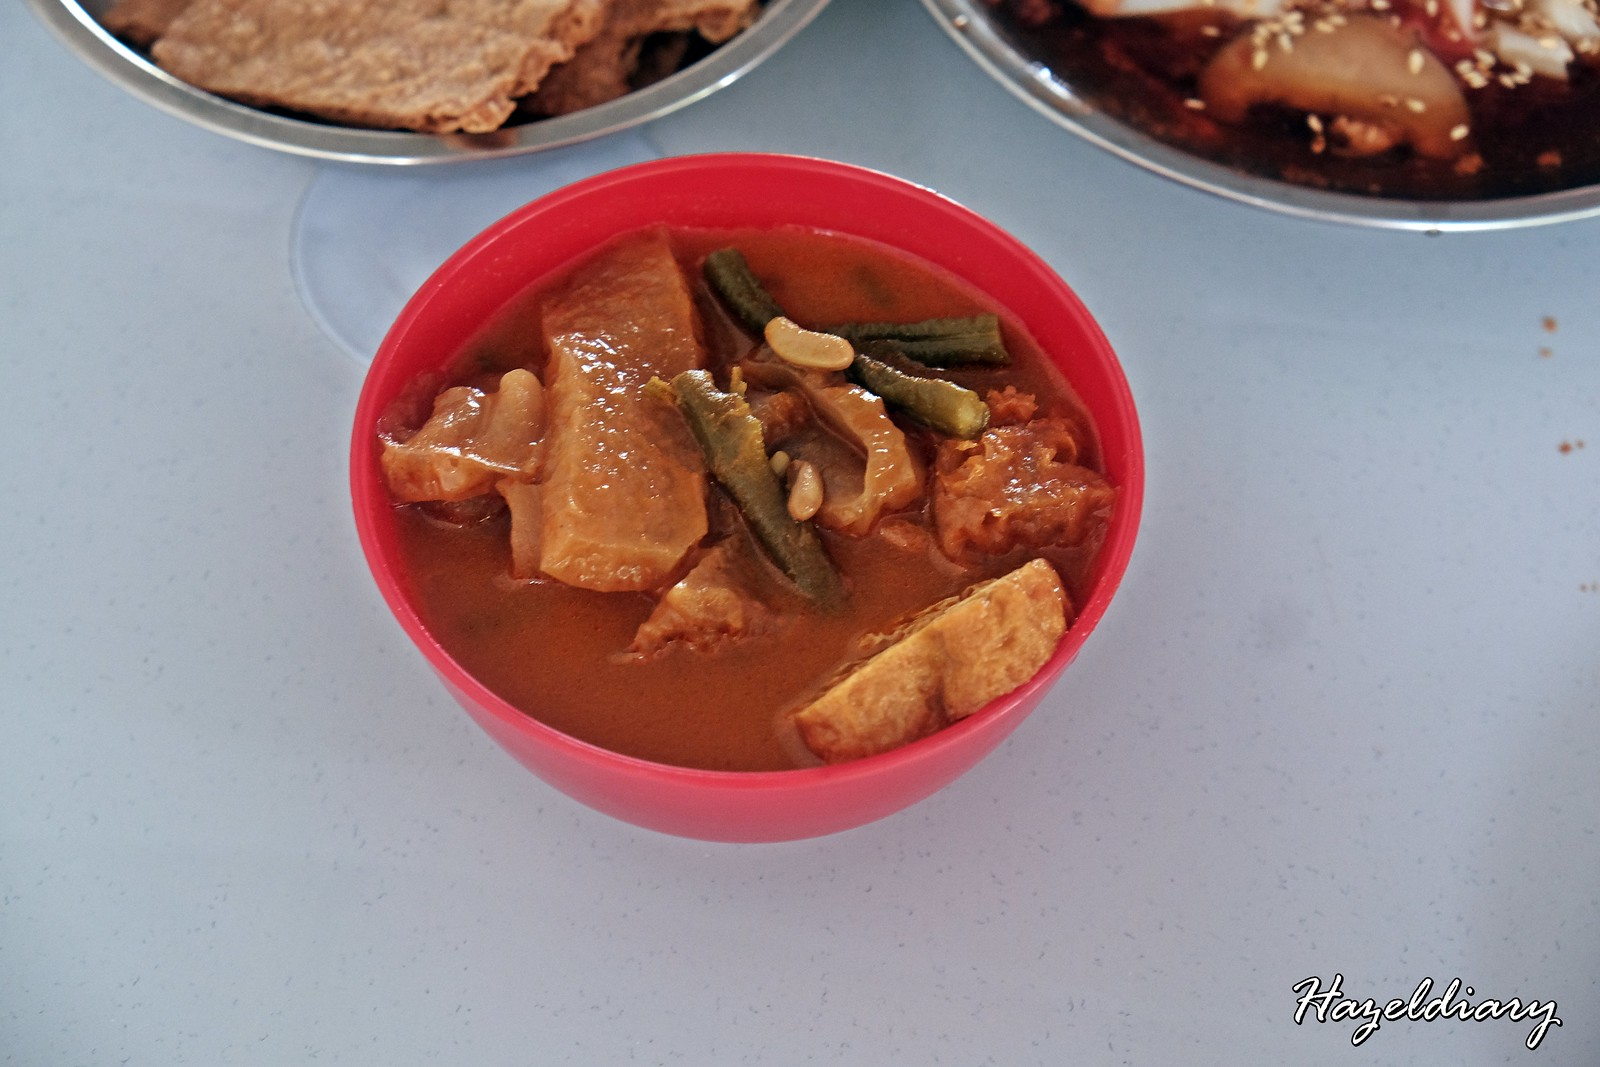 Canning Garden Ipoh-Cheong Fun-Curry